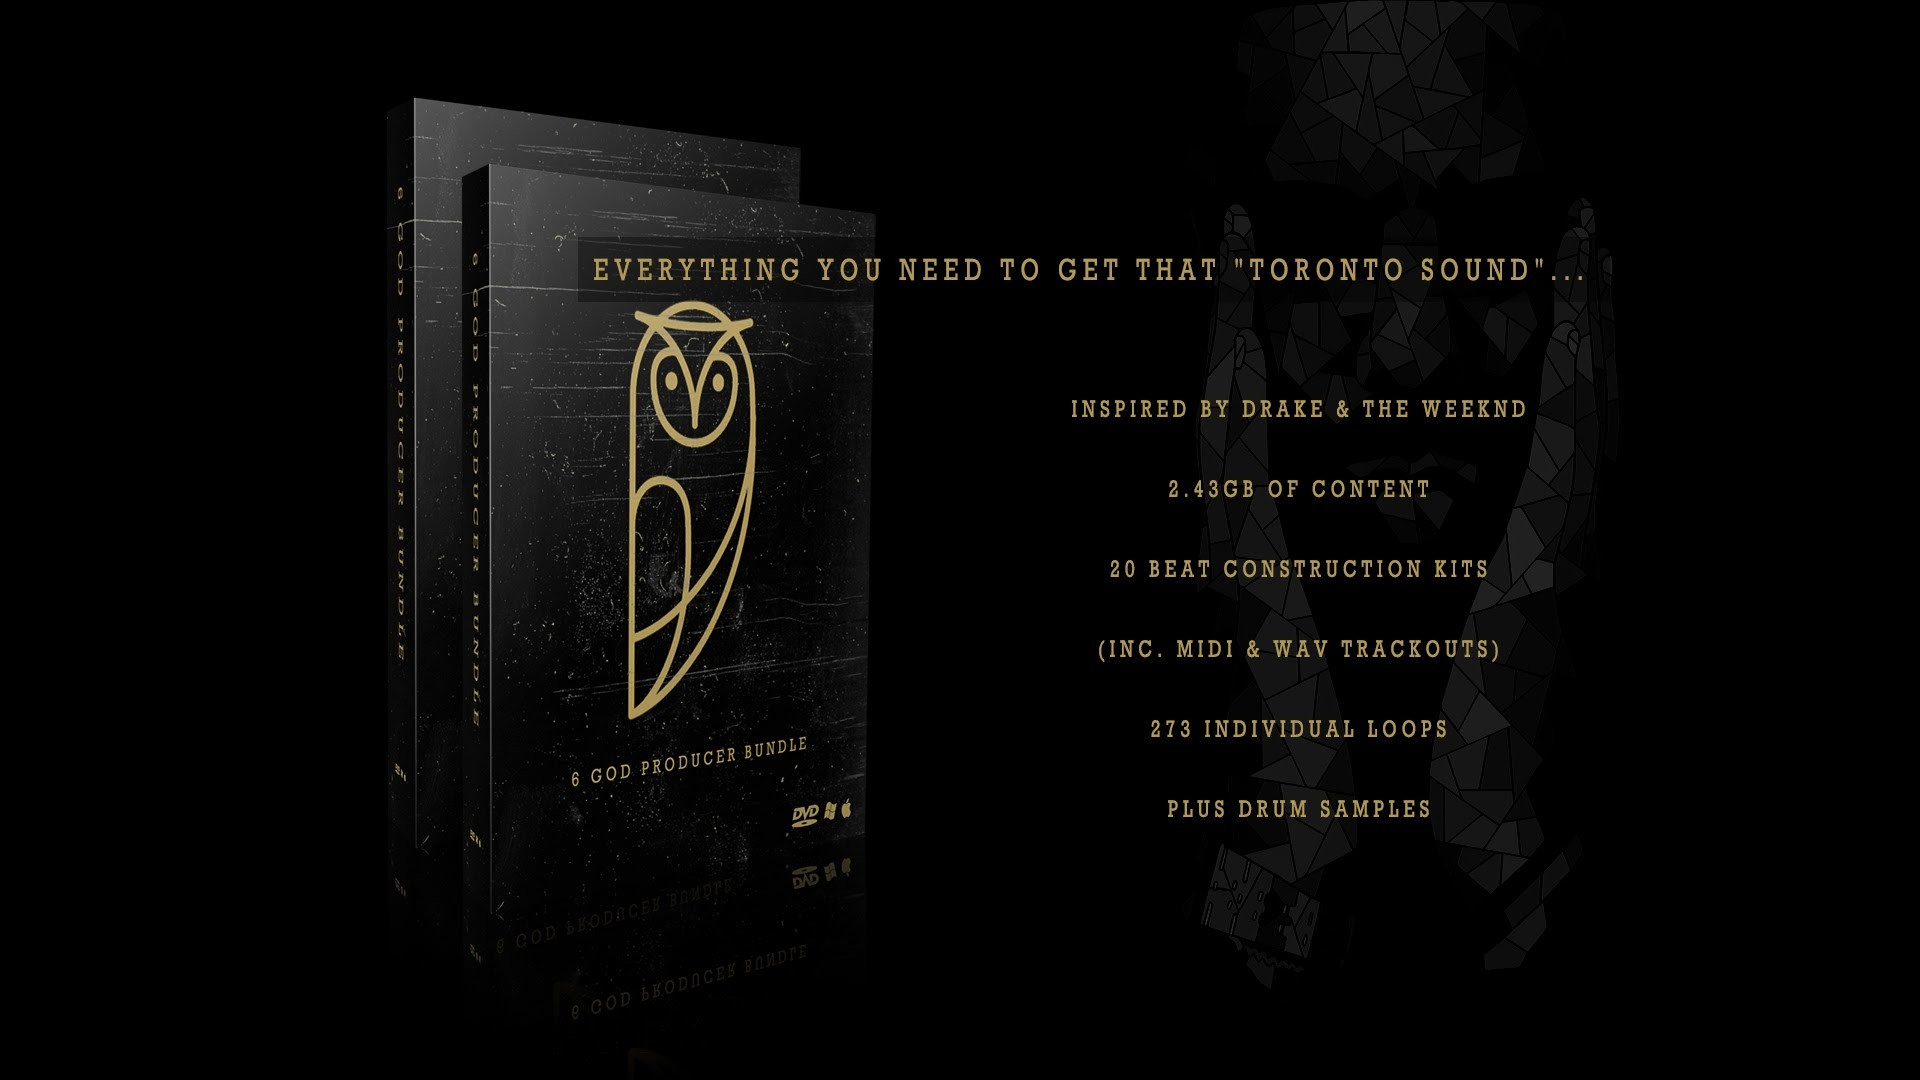 God Producer Bundle (In the style of Drake / Noah 40 Shebib Sample